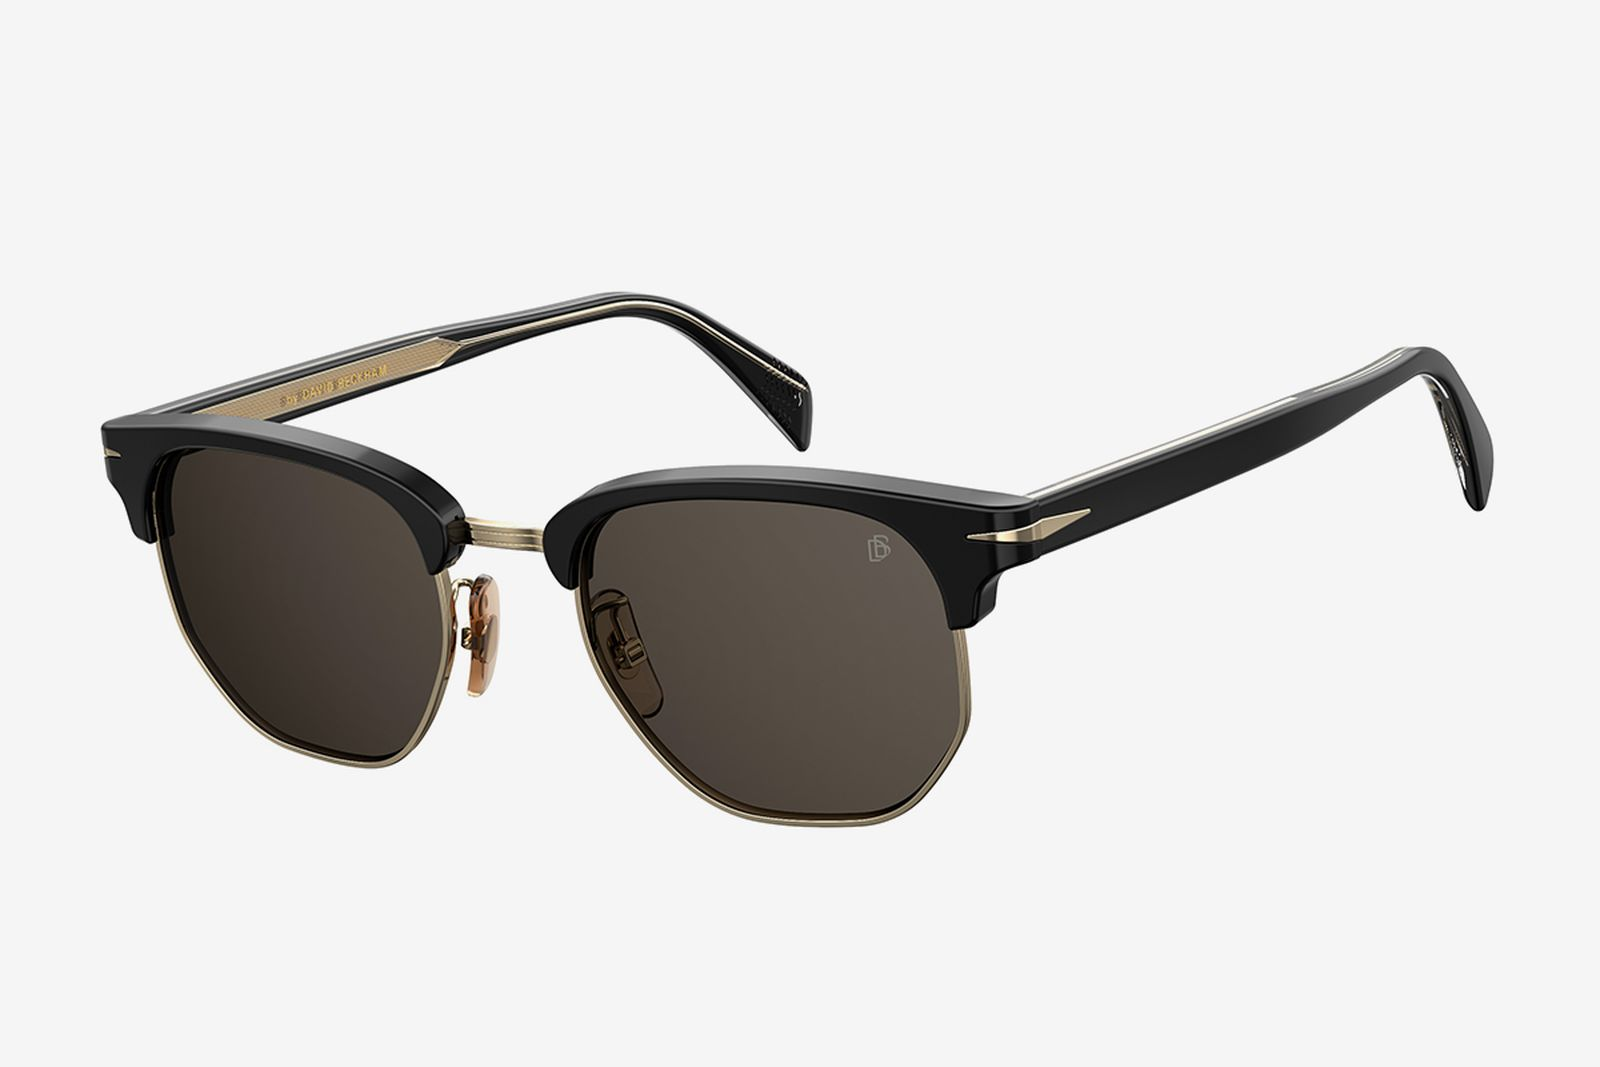 db-sunglasses-ss20-01